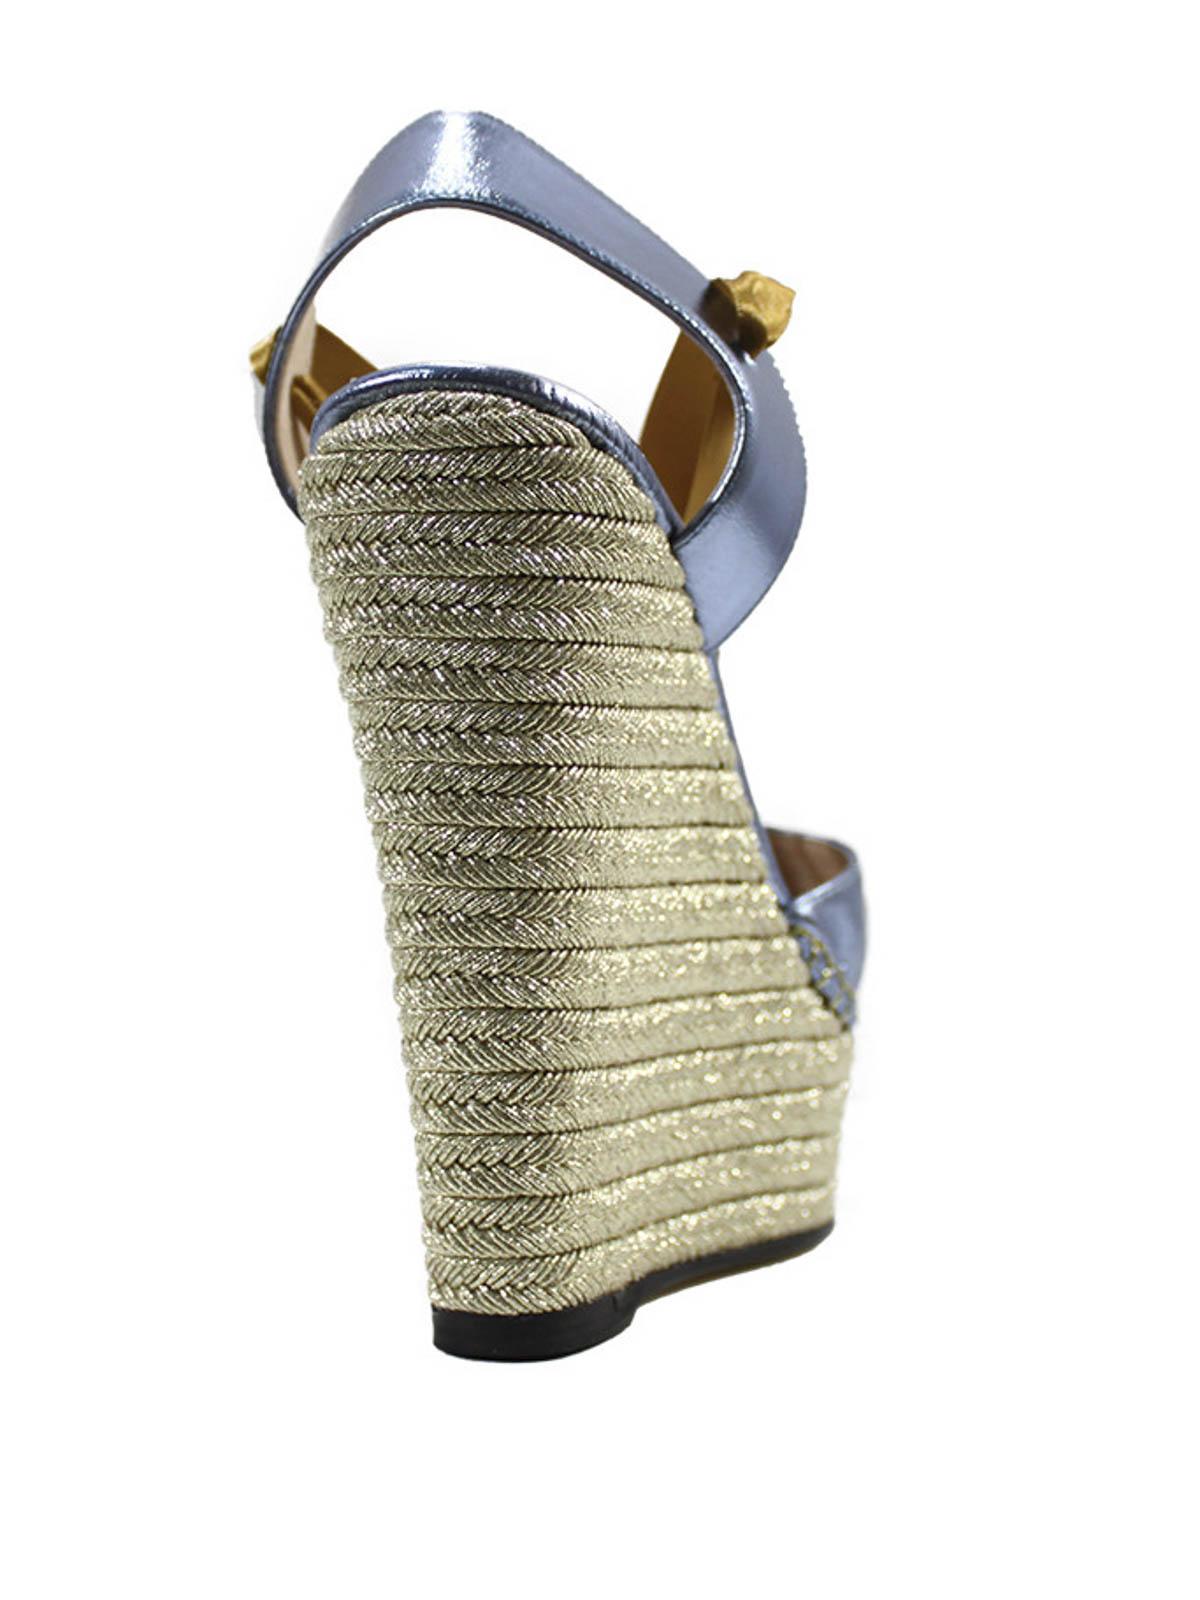 6b8c8832a2d4 Gucci - Alexis metallic leather wrap wedges - sandals - 408223 BJ800 ...